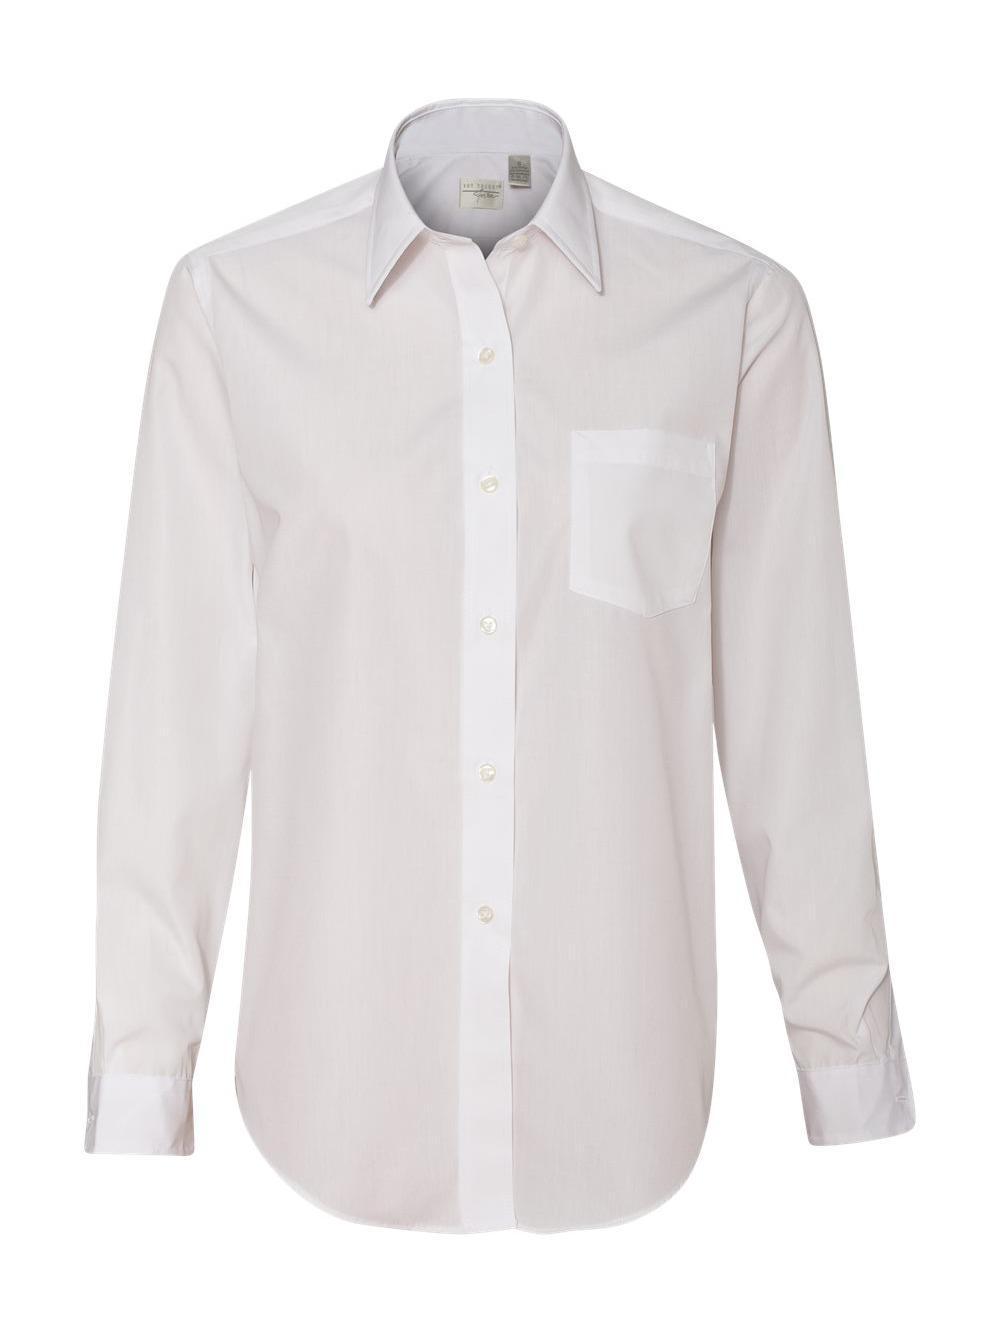 Van-Heusen-Women-039-s-Broadcloth-Long-Sleeve-Shirt-13V0216 thumbnail 6